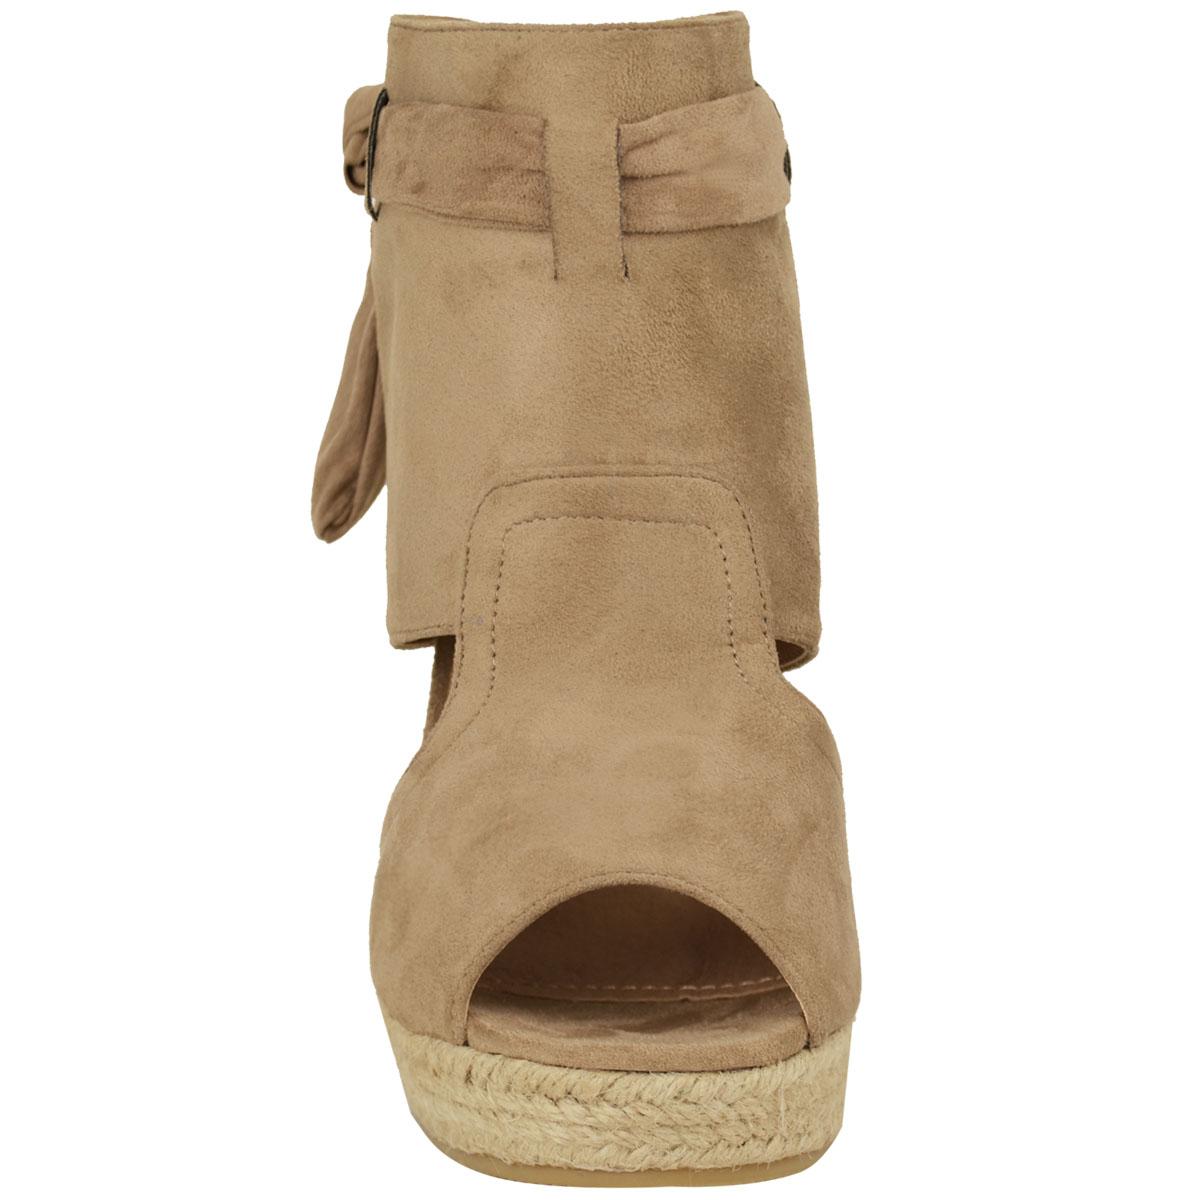 Womens Ladies Summer Sandals High Heels Peep Toe Wedges Tie Up Party Shoes Size   EBay